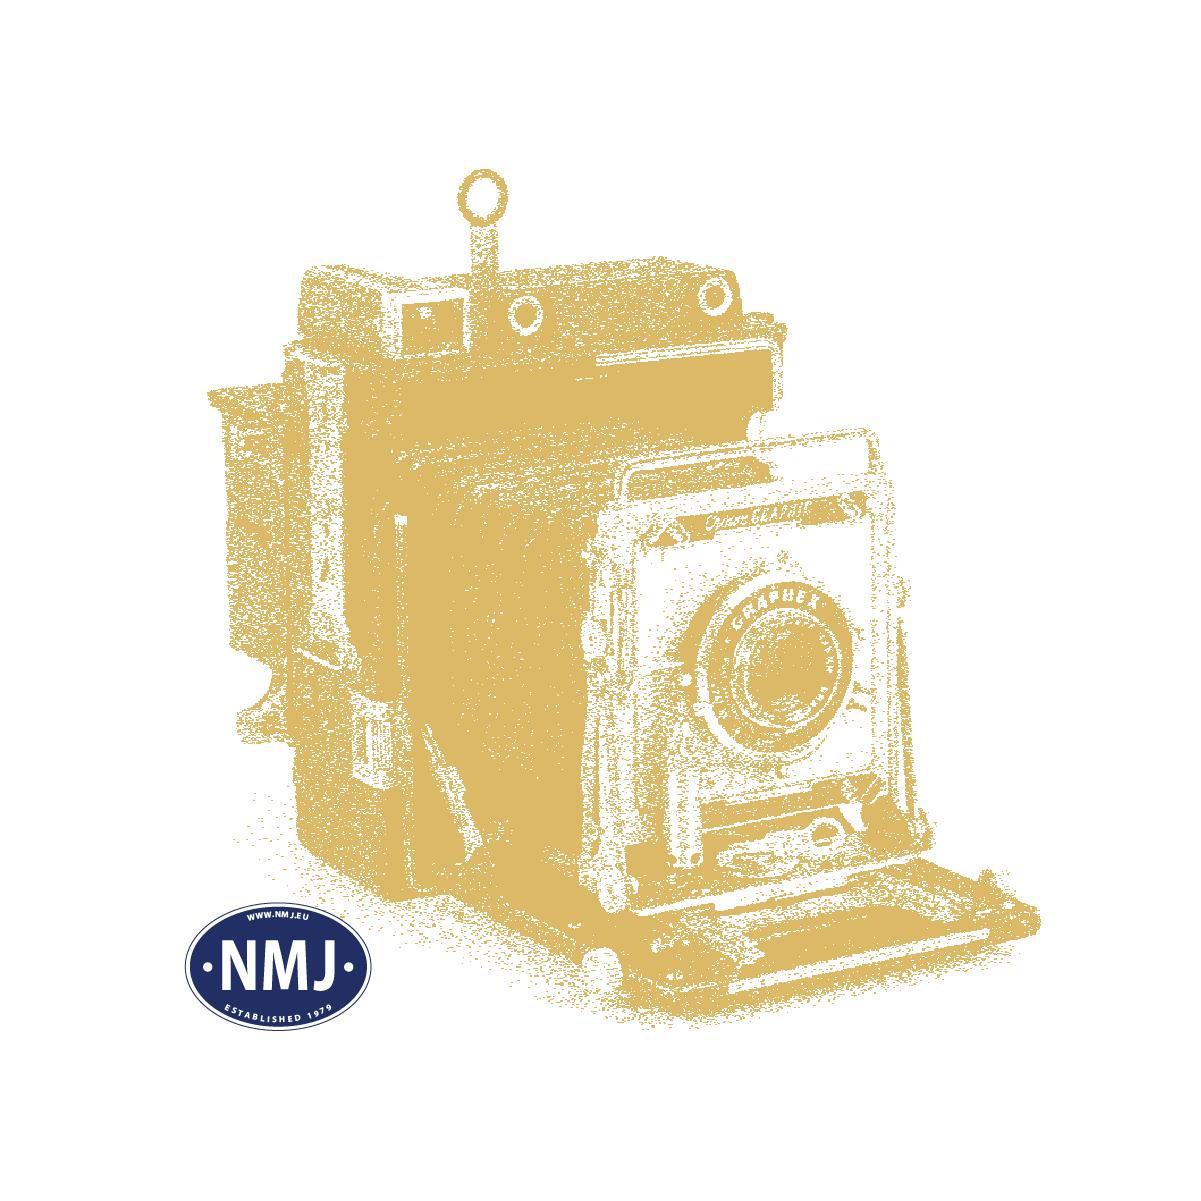 NMJT80.201 ...